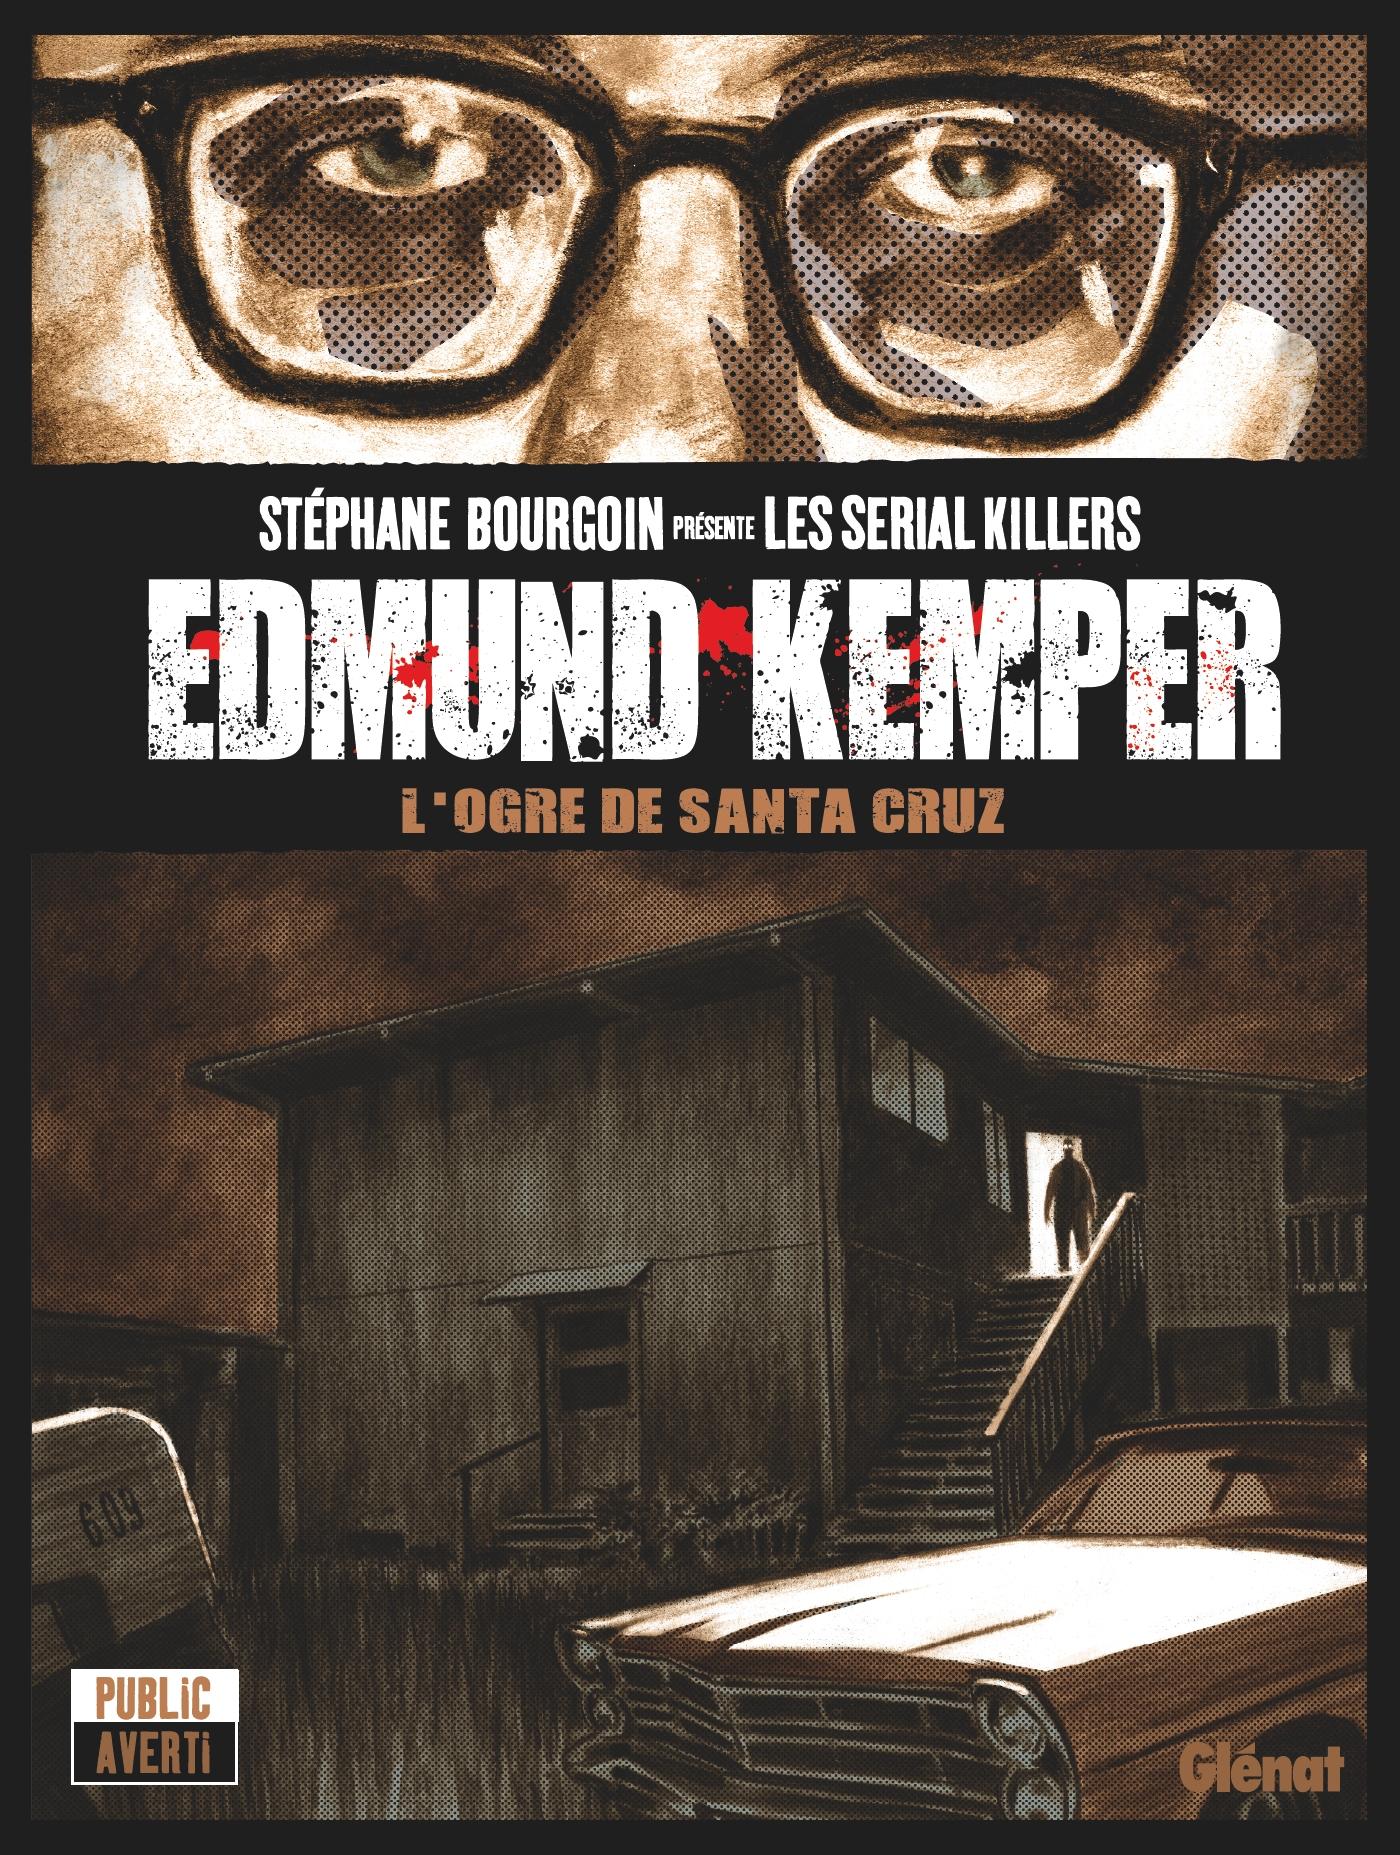 Edmund Kemper 1